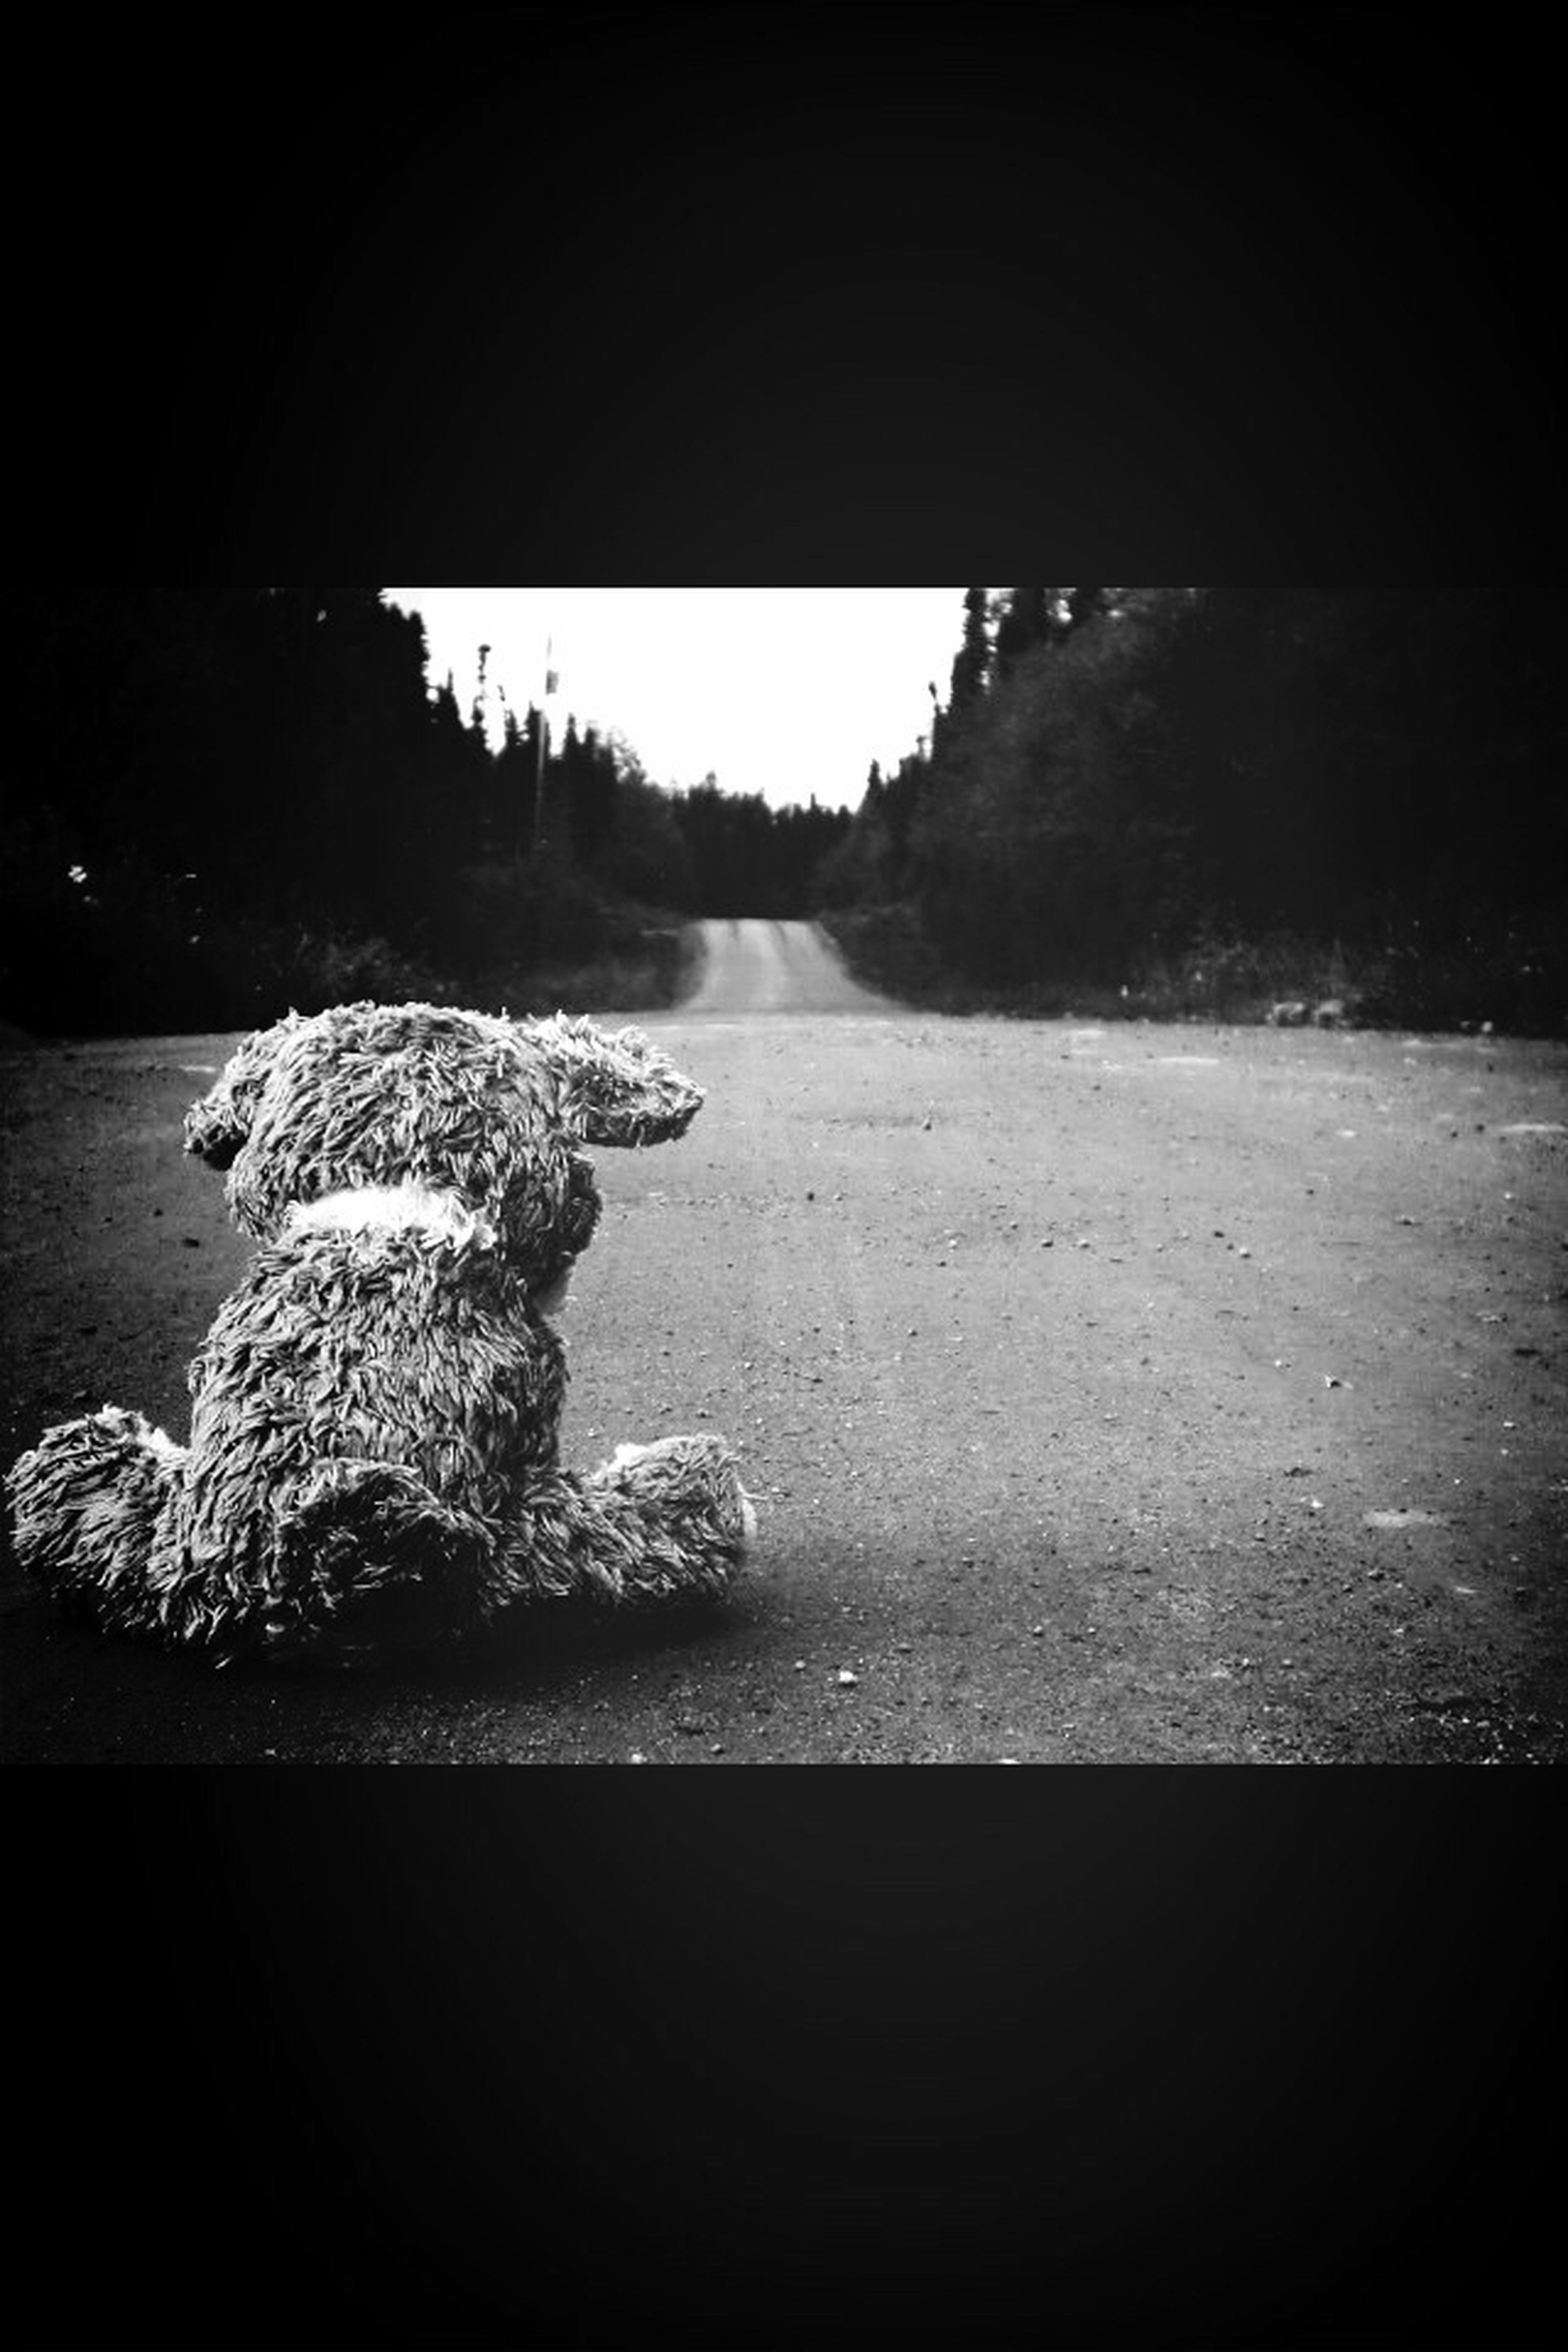 Sad, Lonely And Depressed World.